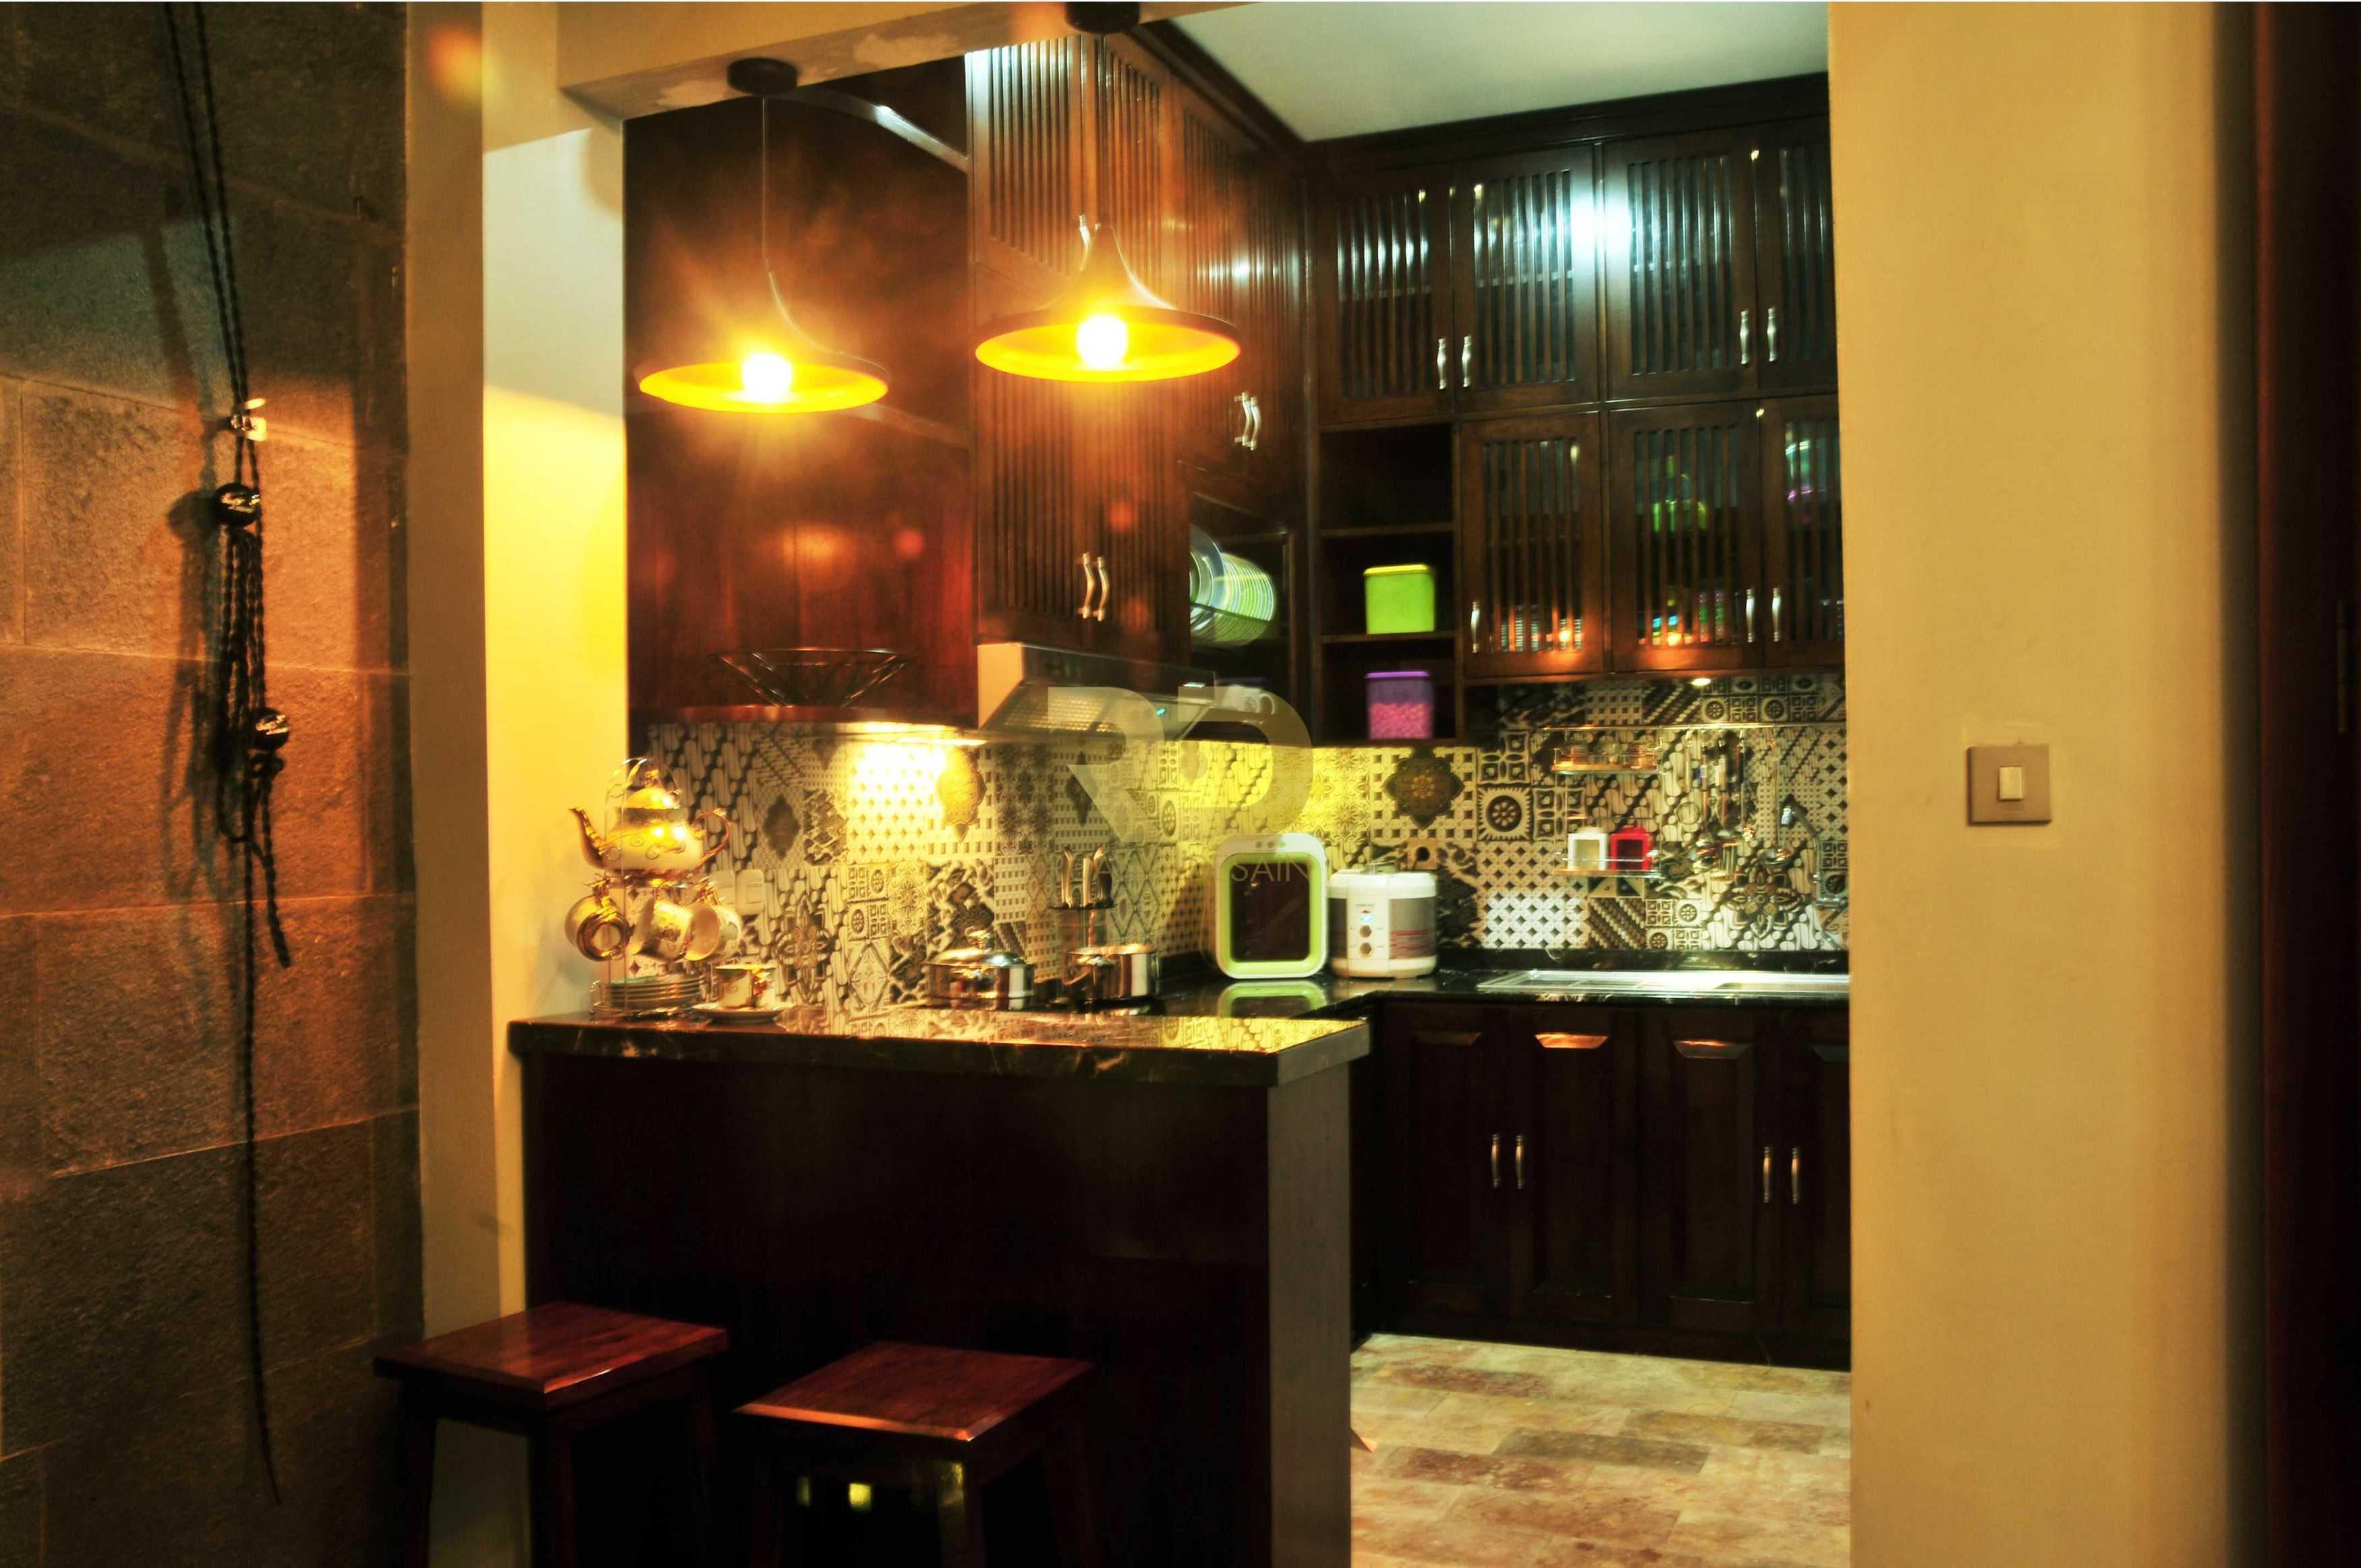 Ruang Desain Solid Wood Kitchen Surabaya, Kota Sby, Jawa Timur, Indonesia Surabaya, Kota Sby, Jawa Timur, Indonesia Ruang-Desain-Solid-Wood-Kitchen   93961